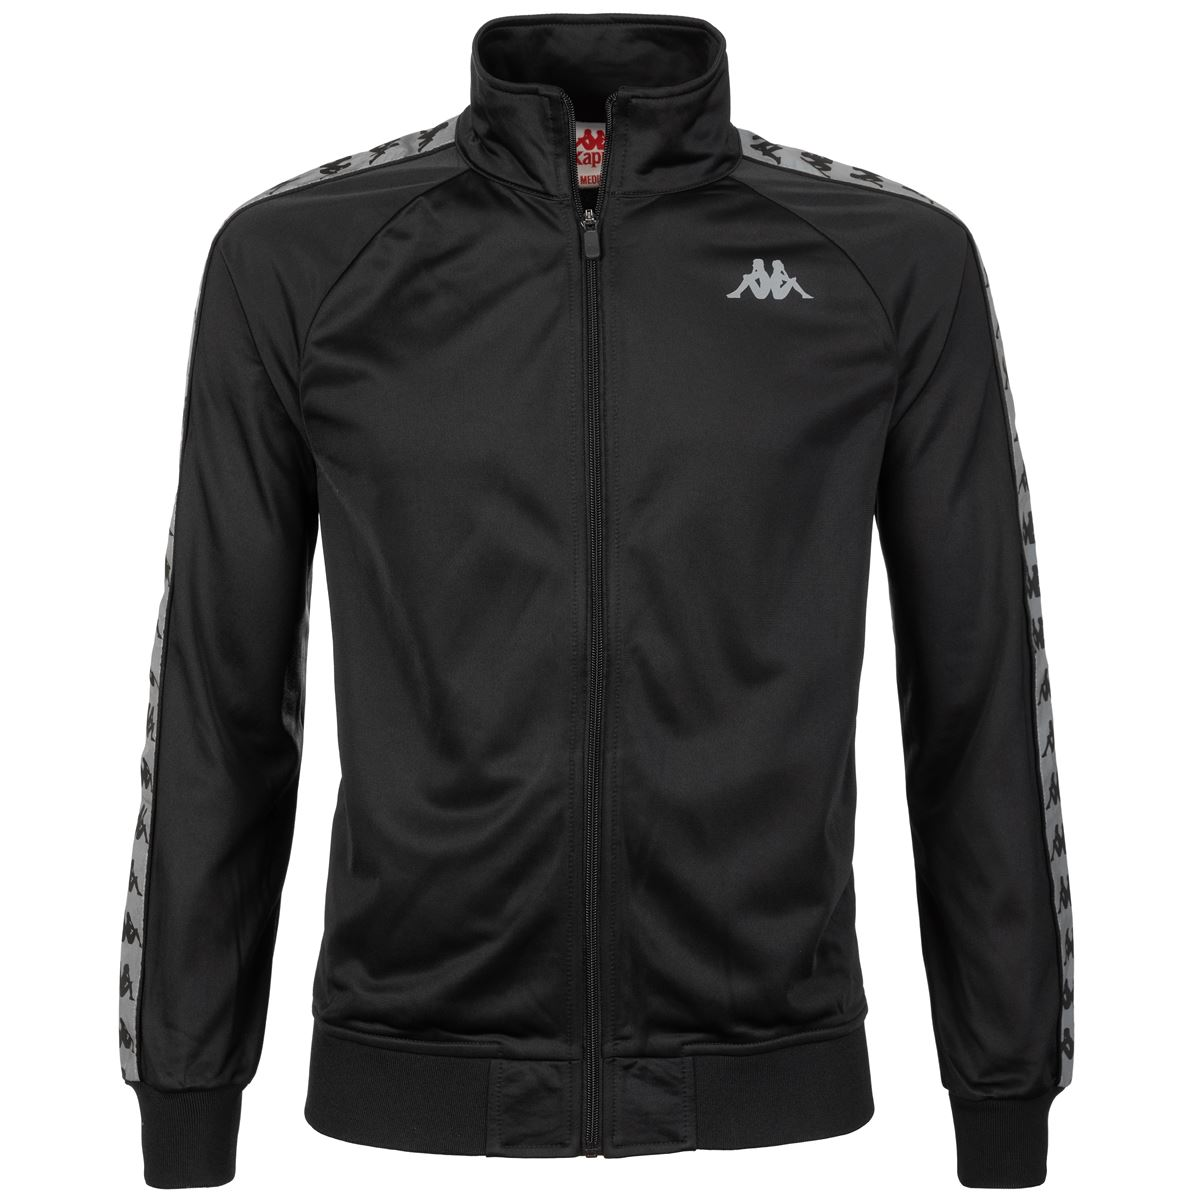 Felpa da uomo in tricot garzato Kappa | Felpe | 304UTJ0900 BLACK-GREYREFLECTIVE